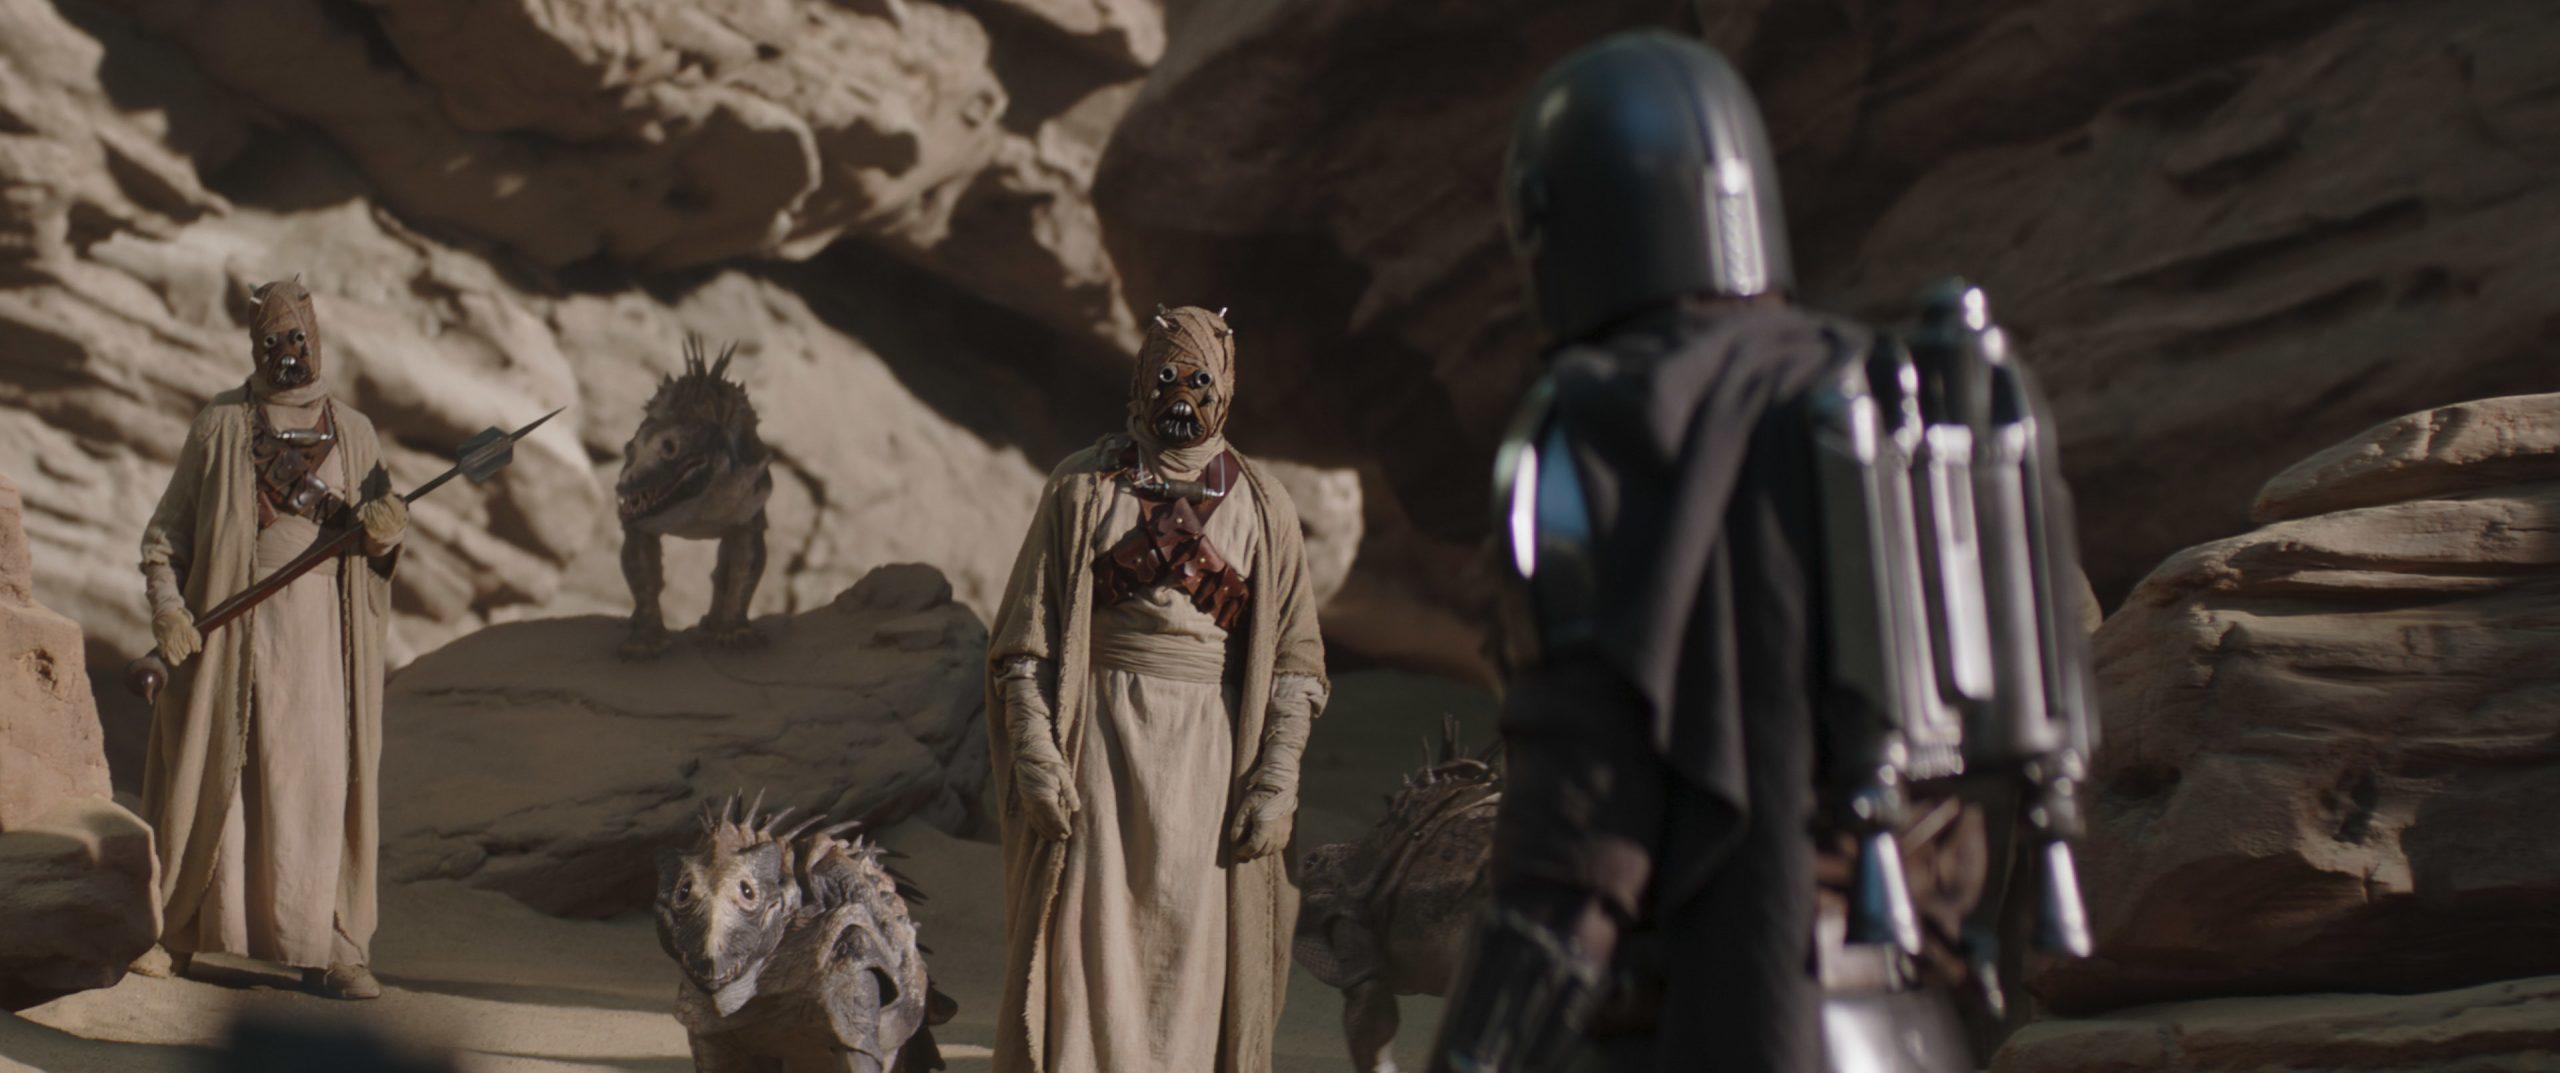 Mando speaks with the Tusken Raiders in 'The Mandalorian' Season 2.